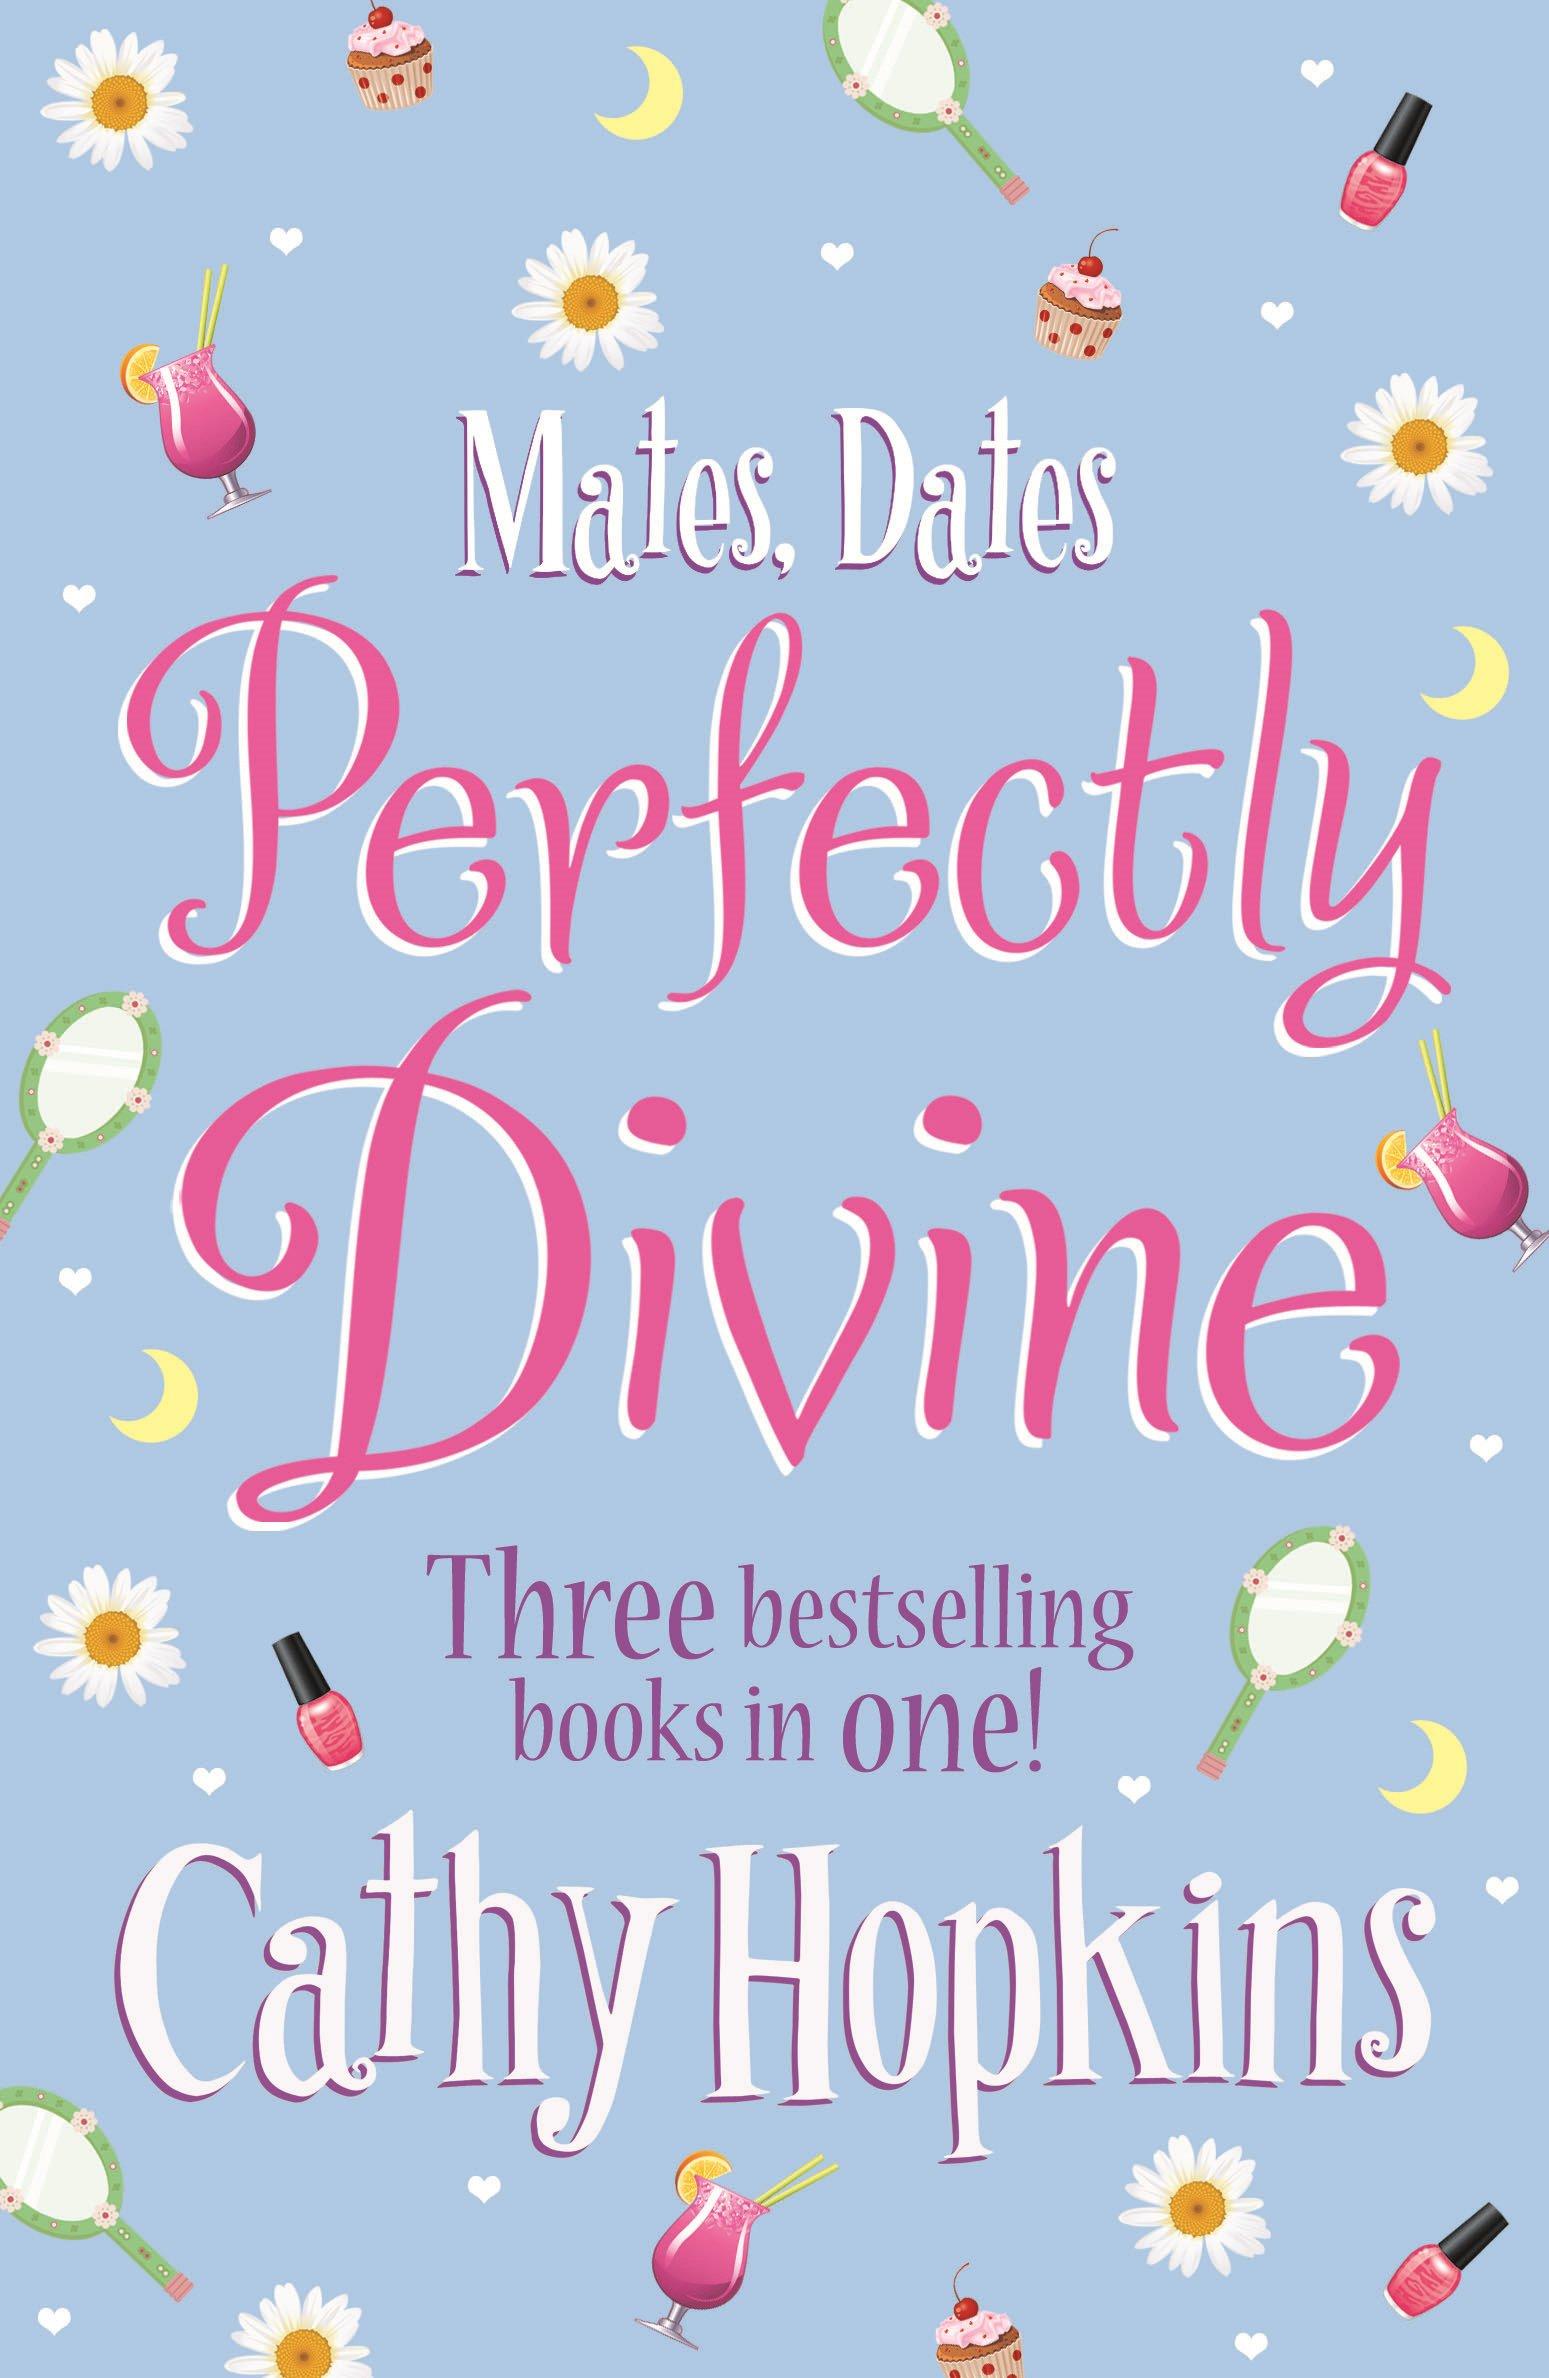 Download Mates, Dates Perfectly Divine pdf epub